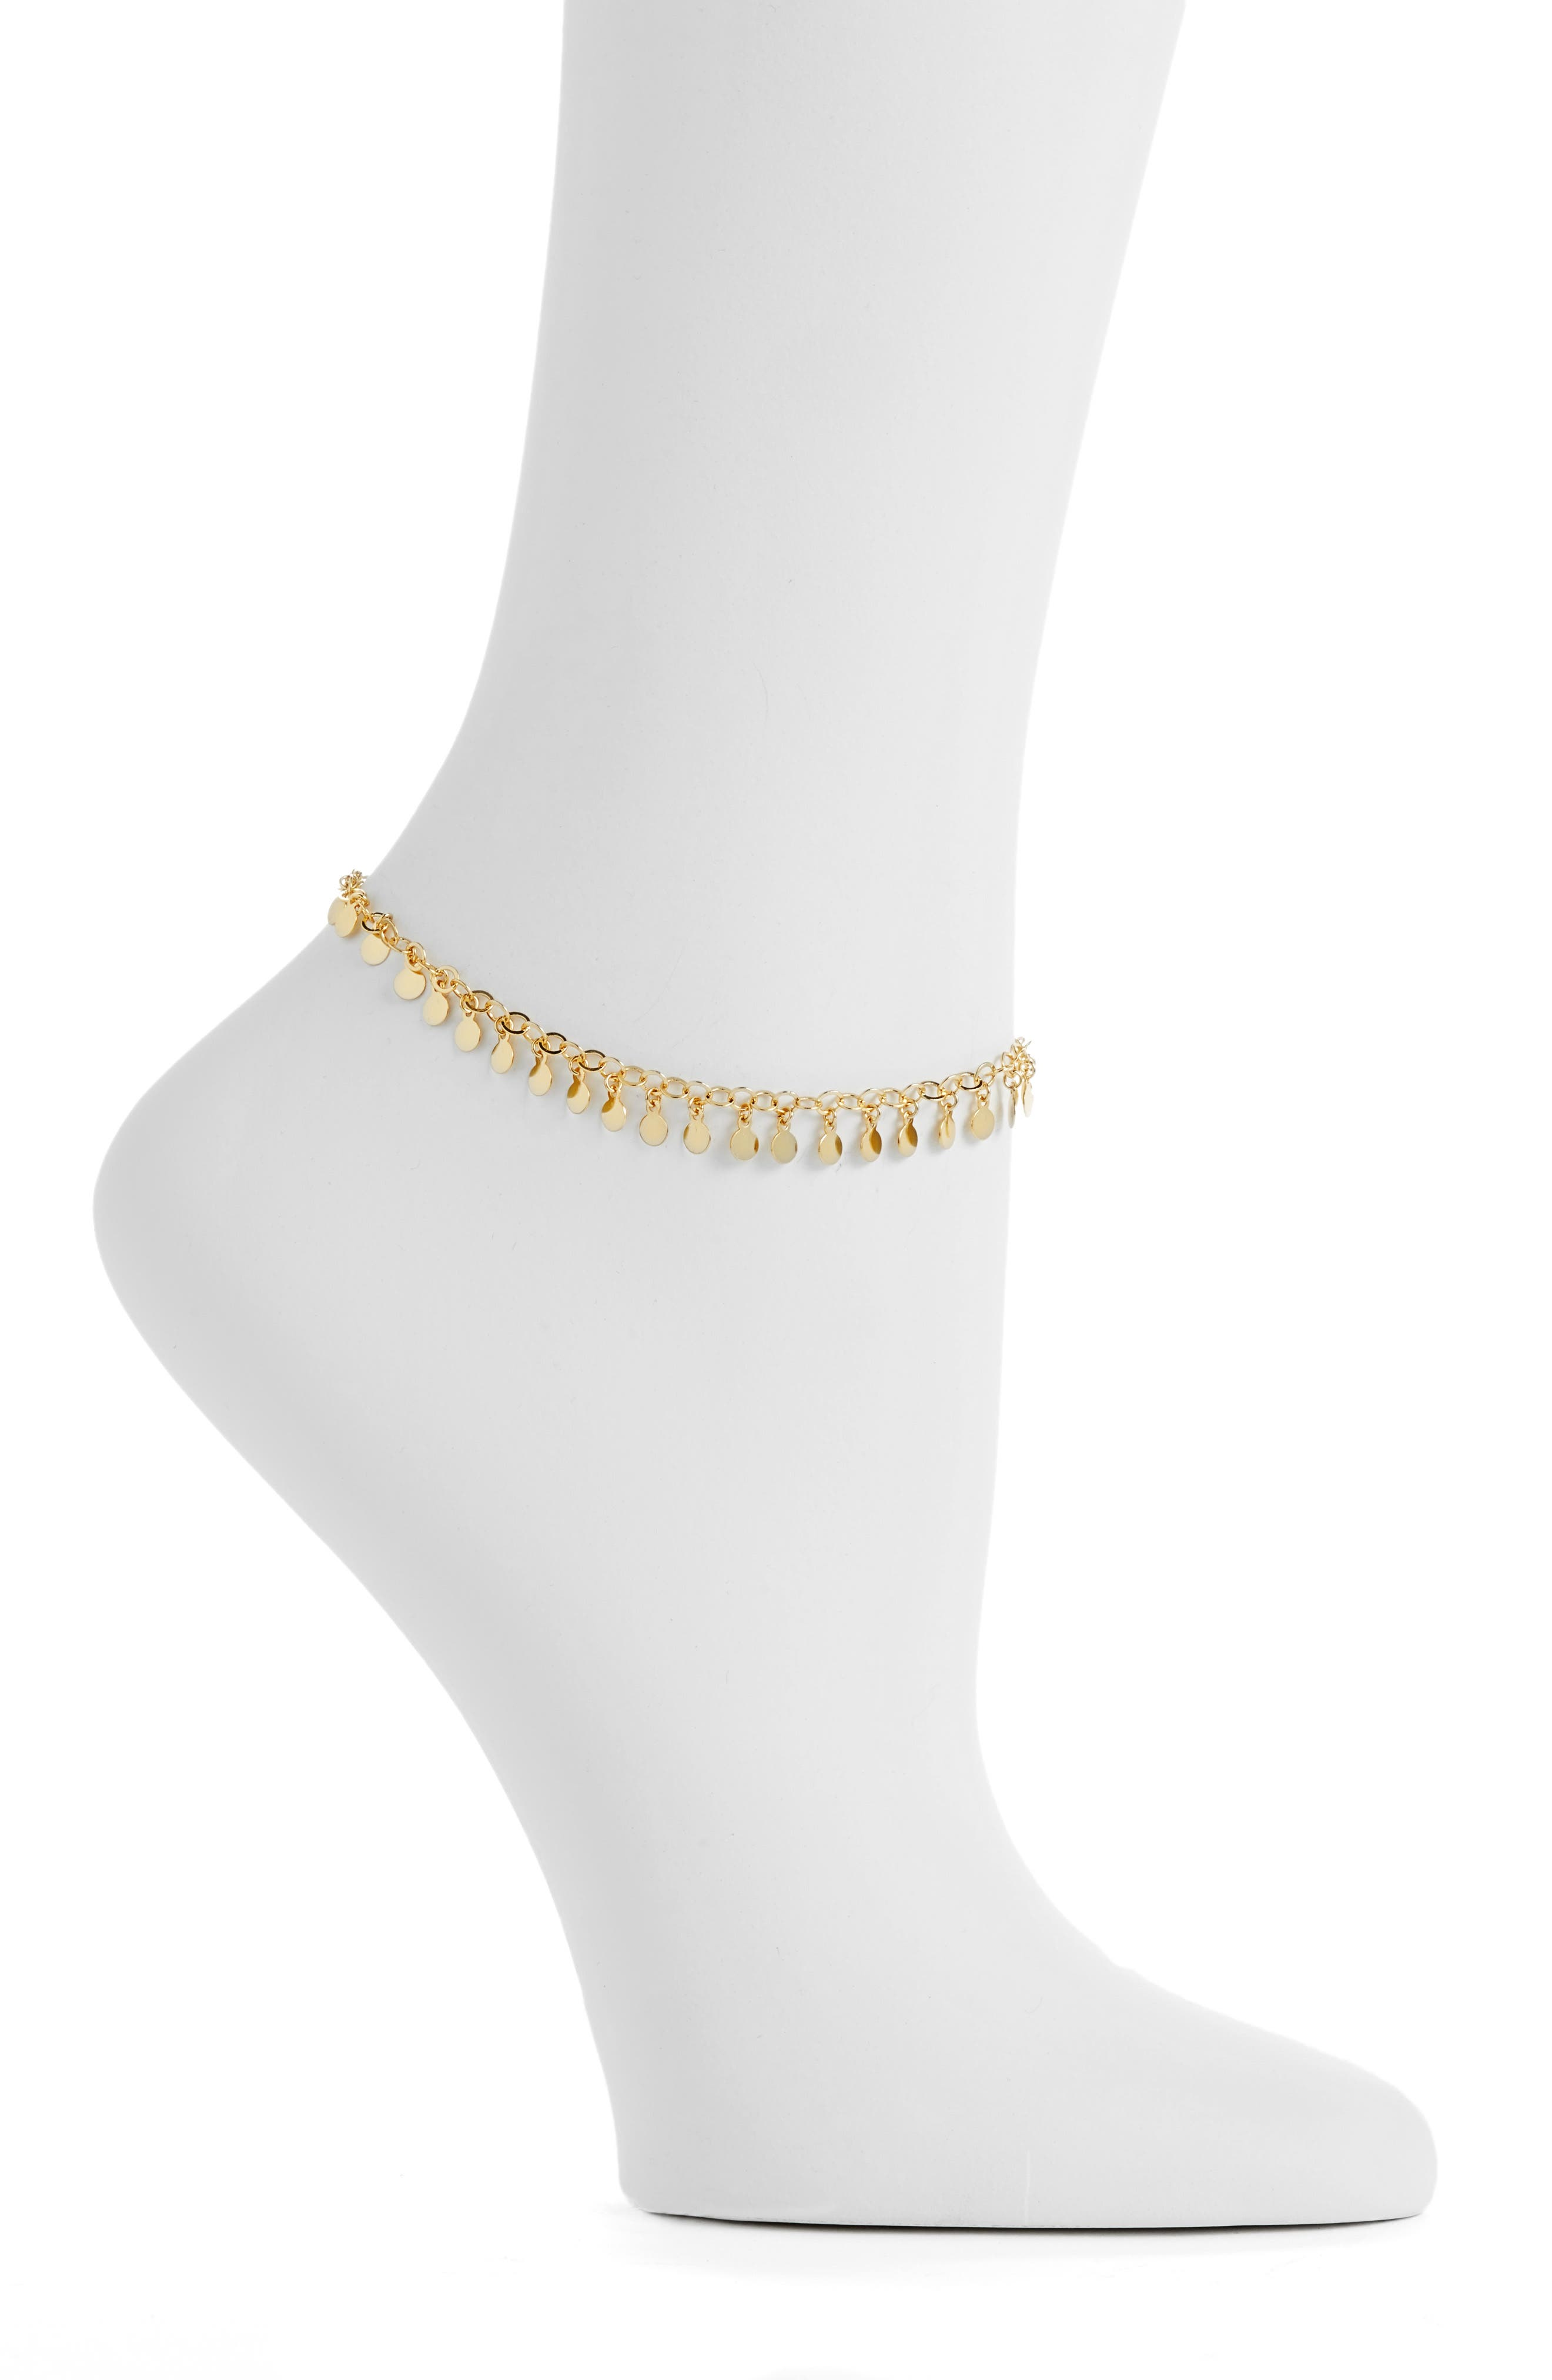 Argento Vivo Carmen Chain Anklet